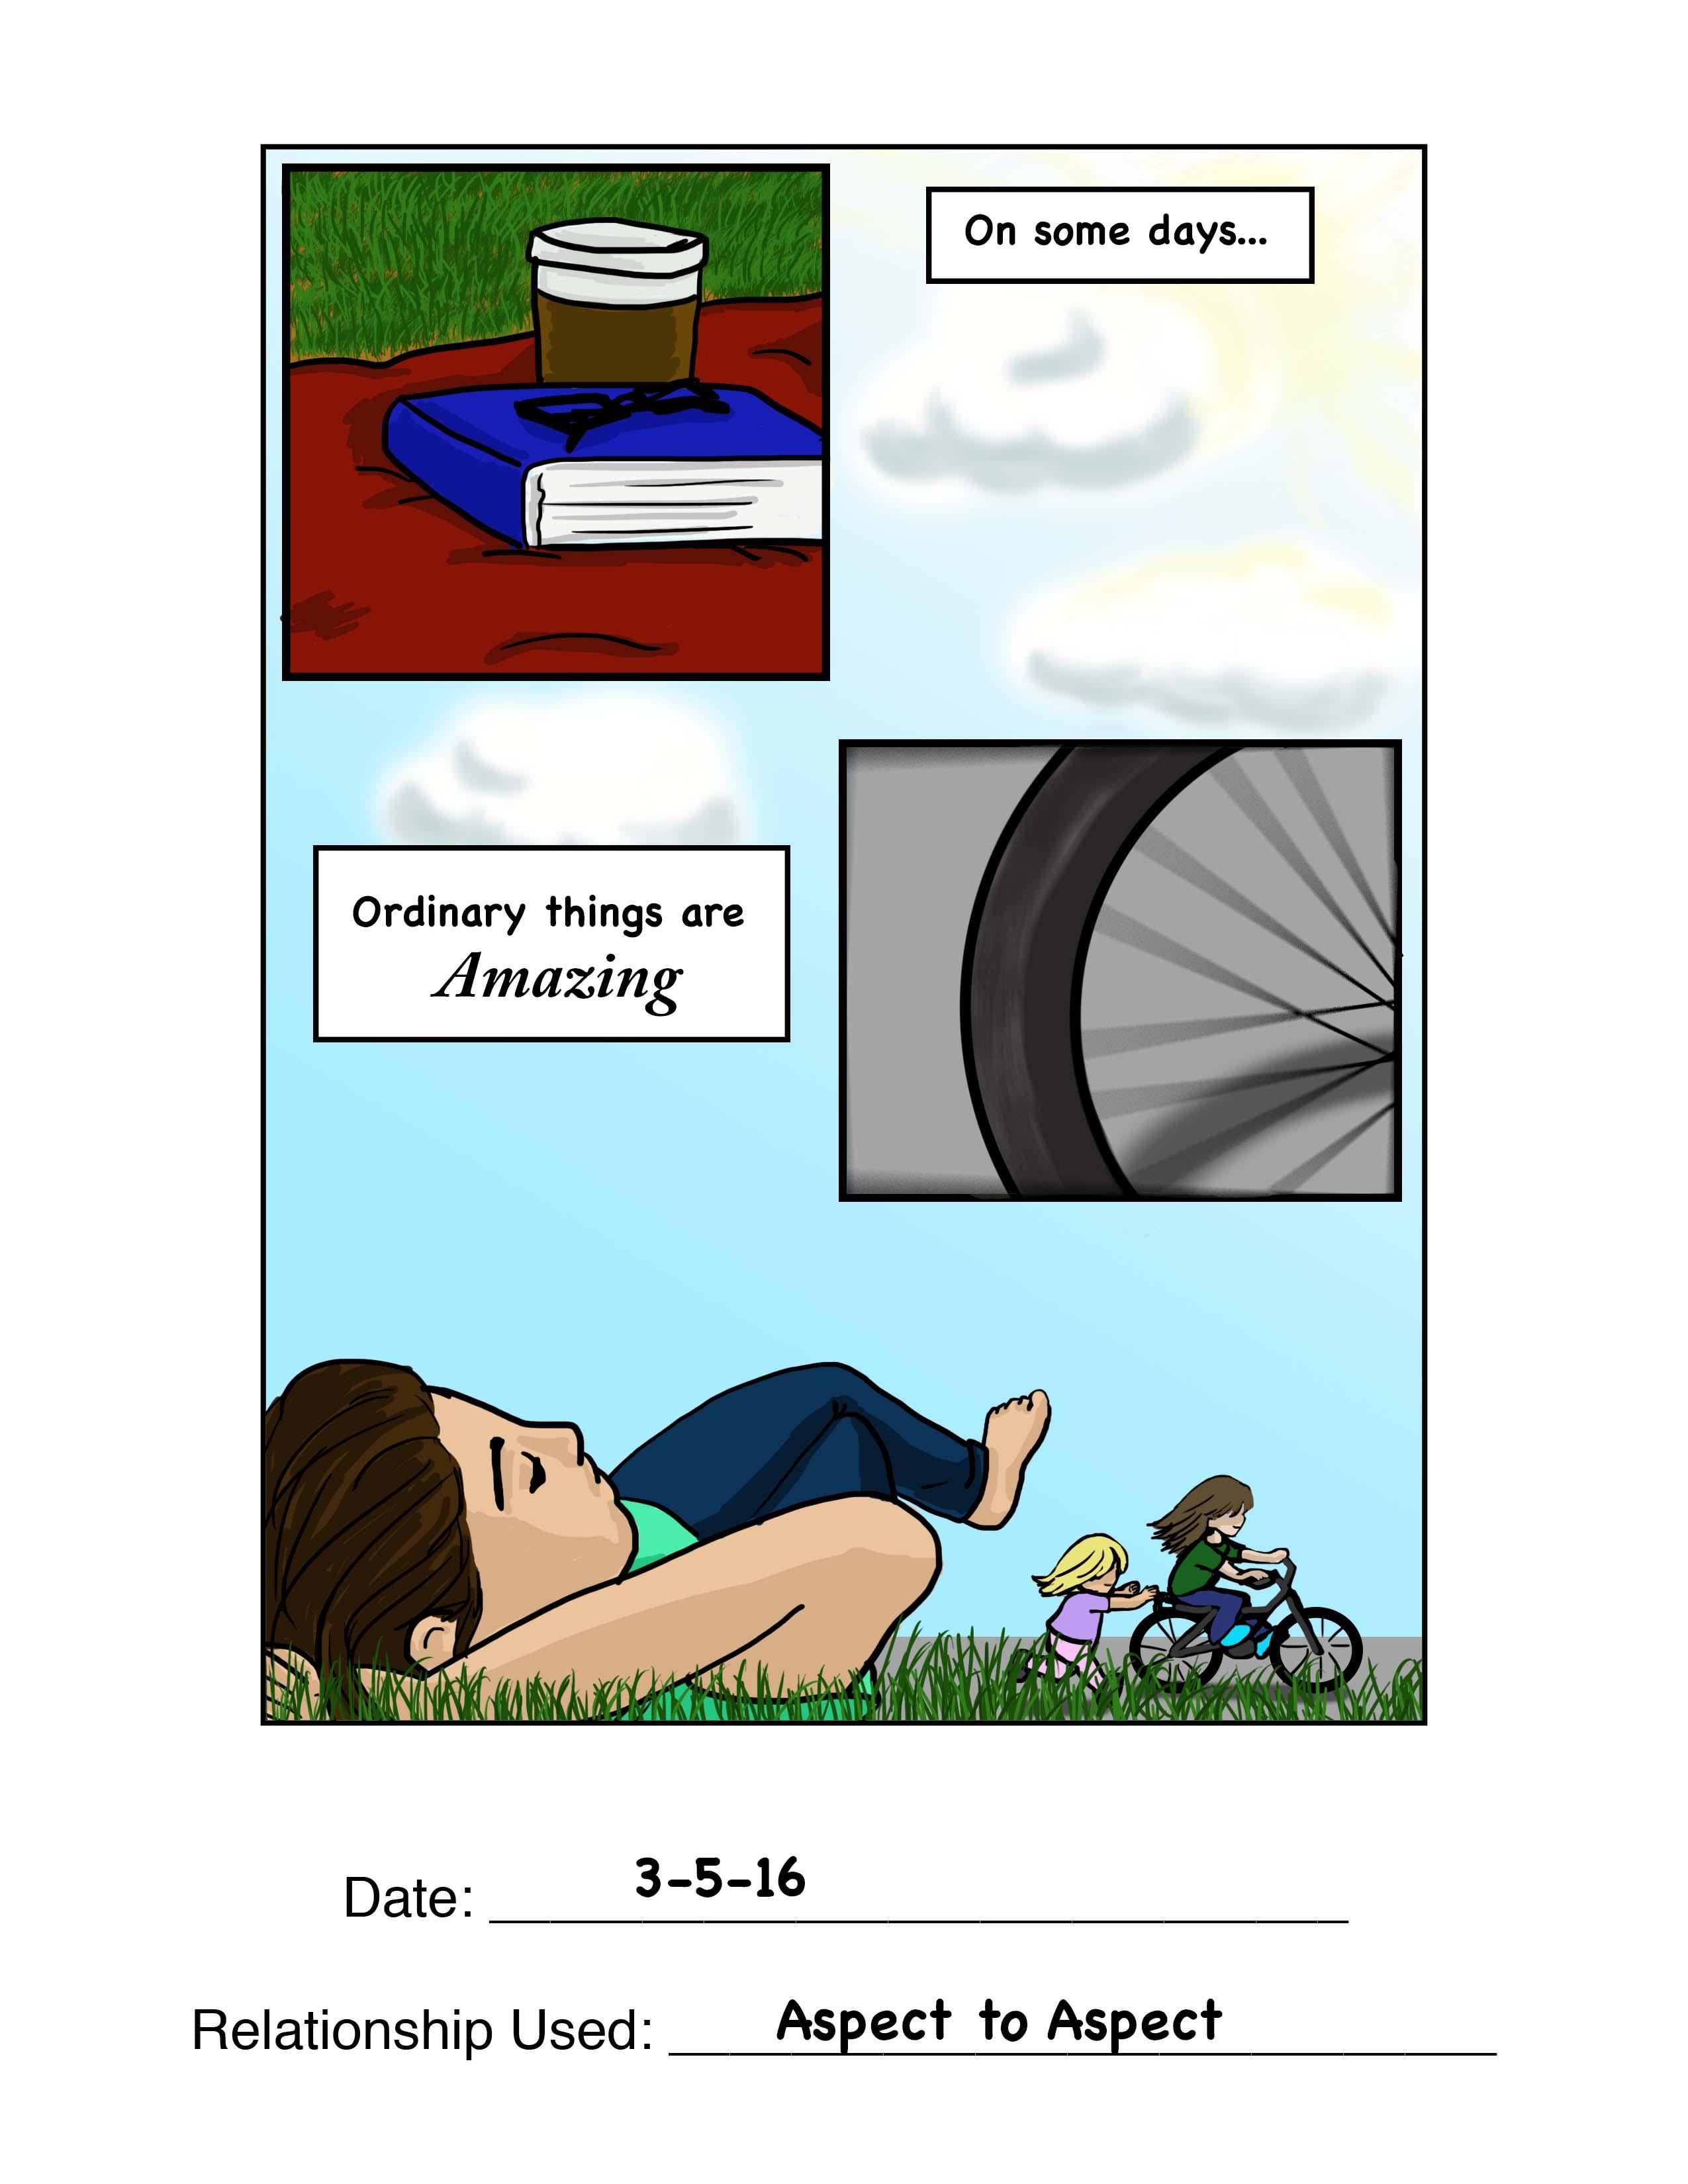 Aspect to Aspect Comic